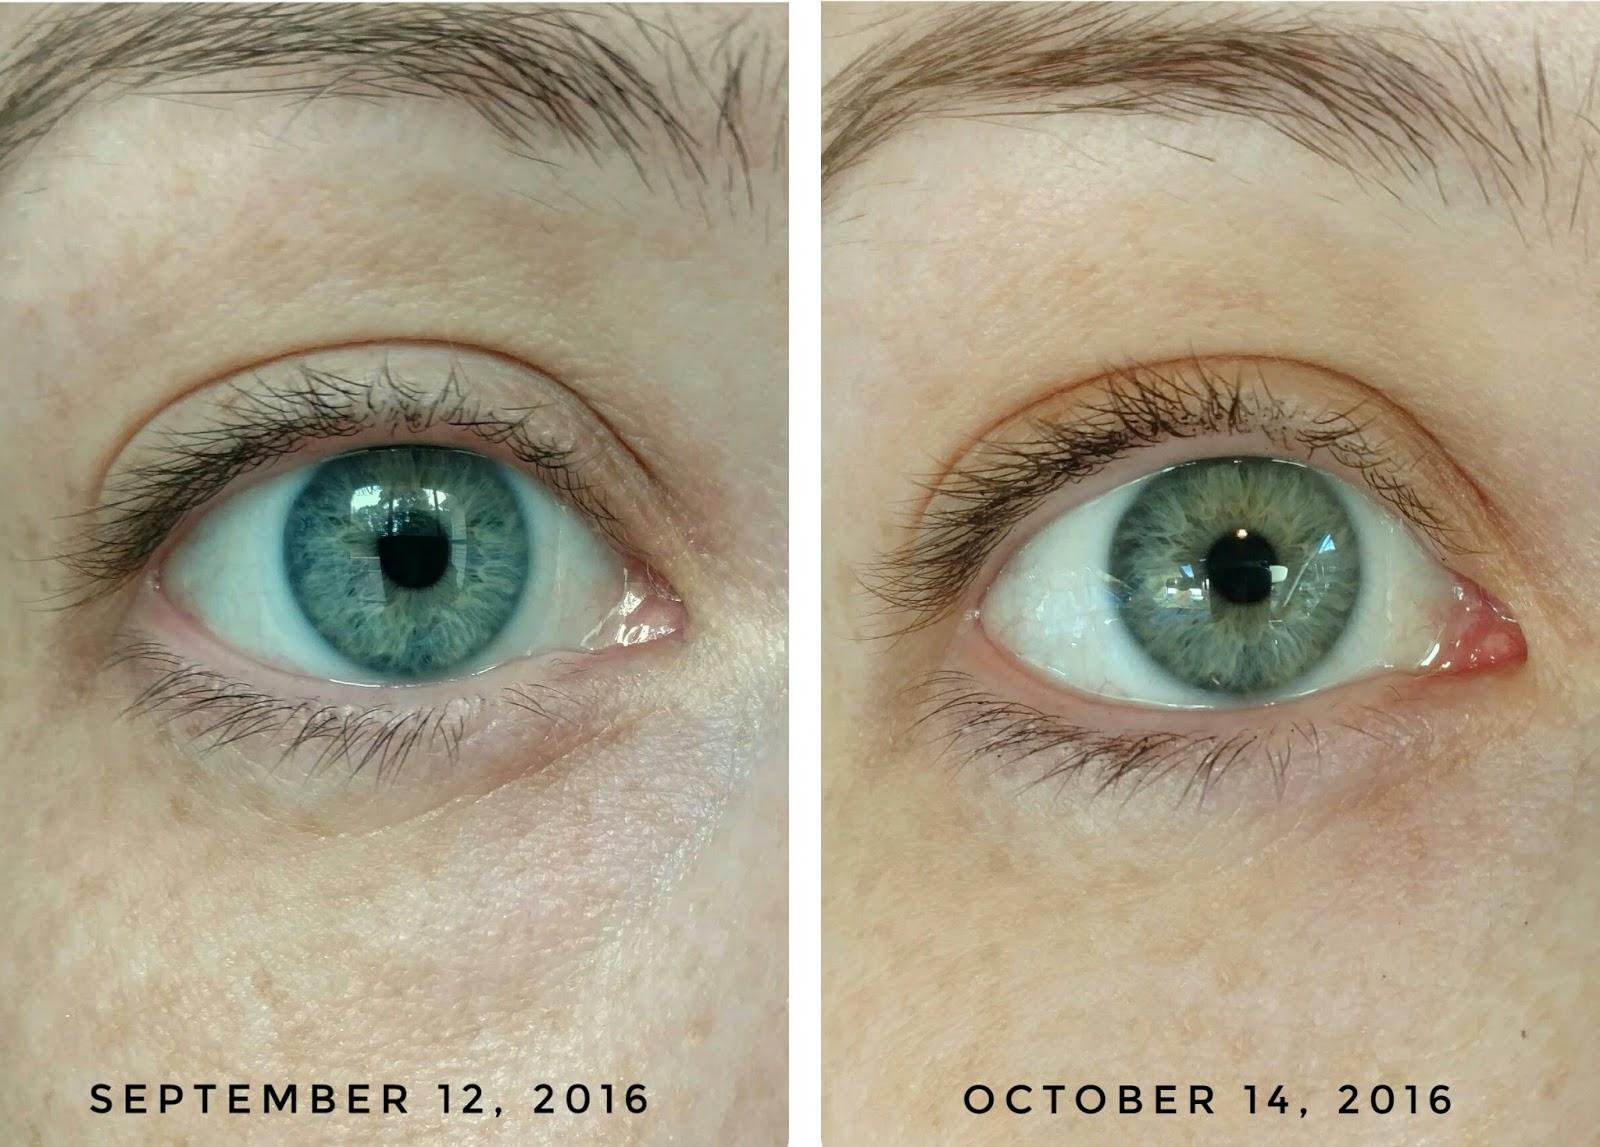 IT Cosmetics Bye Bye Under Eye Eye Cream Review | The Budget ...